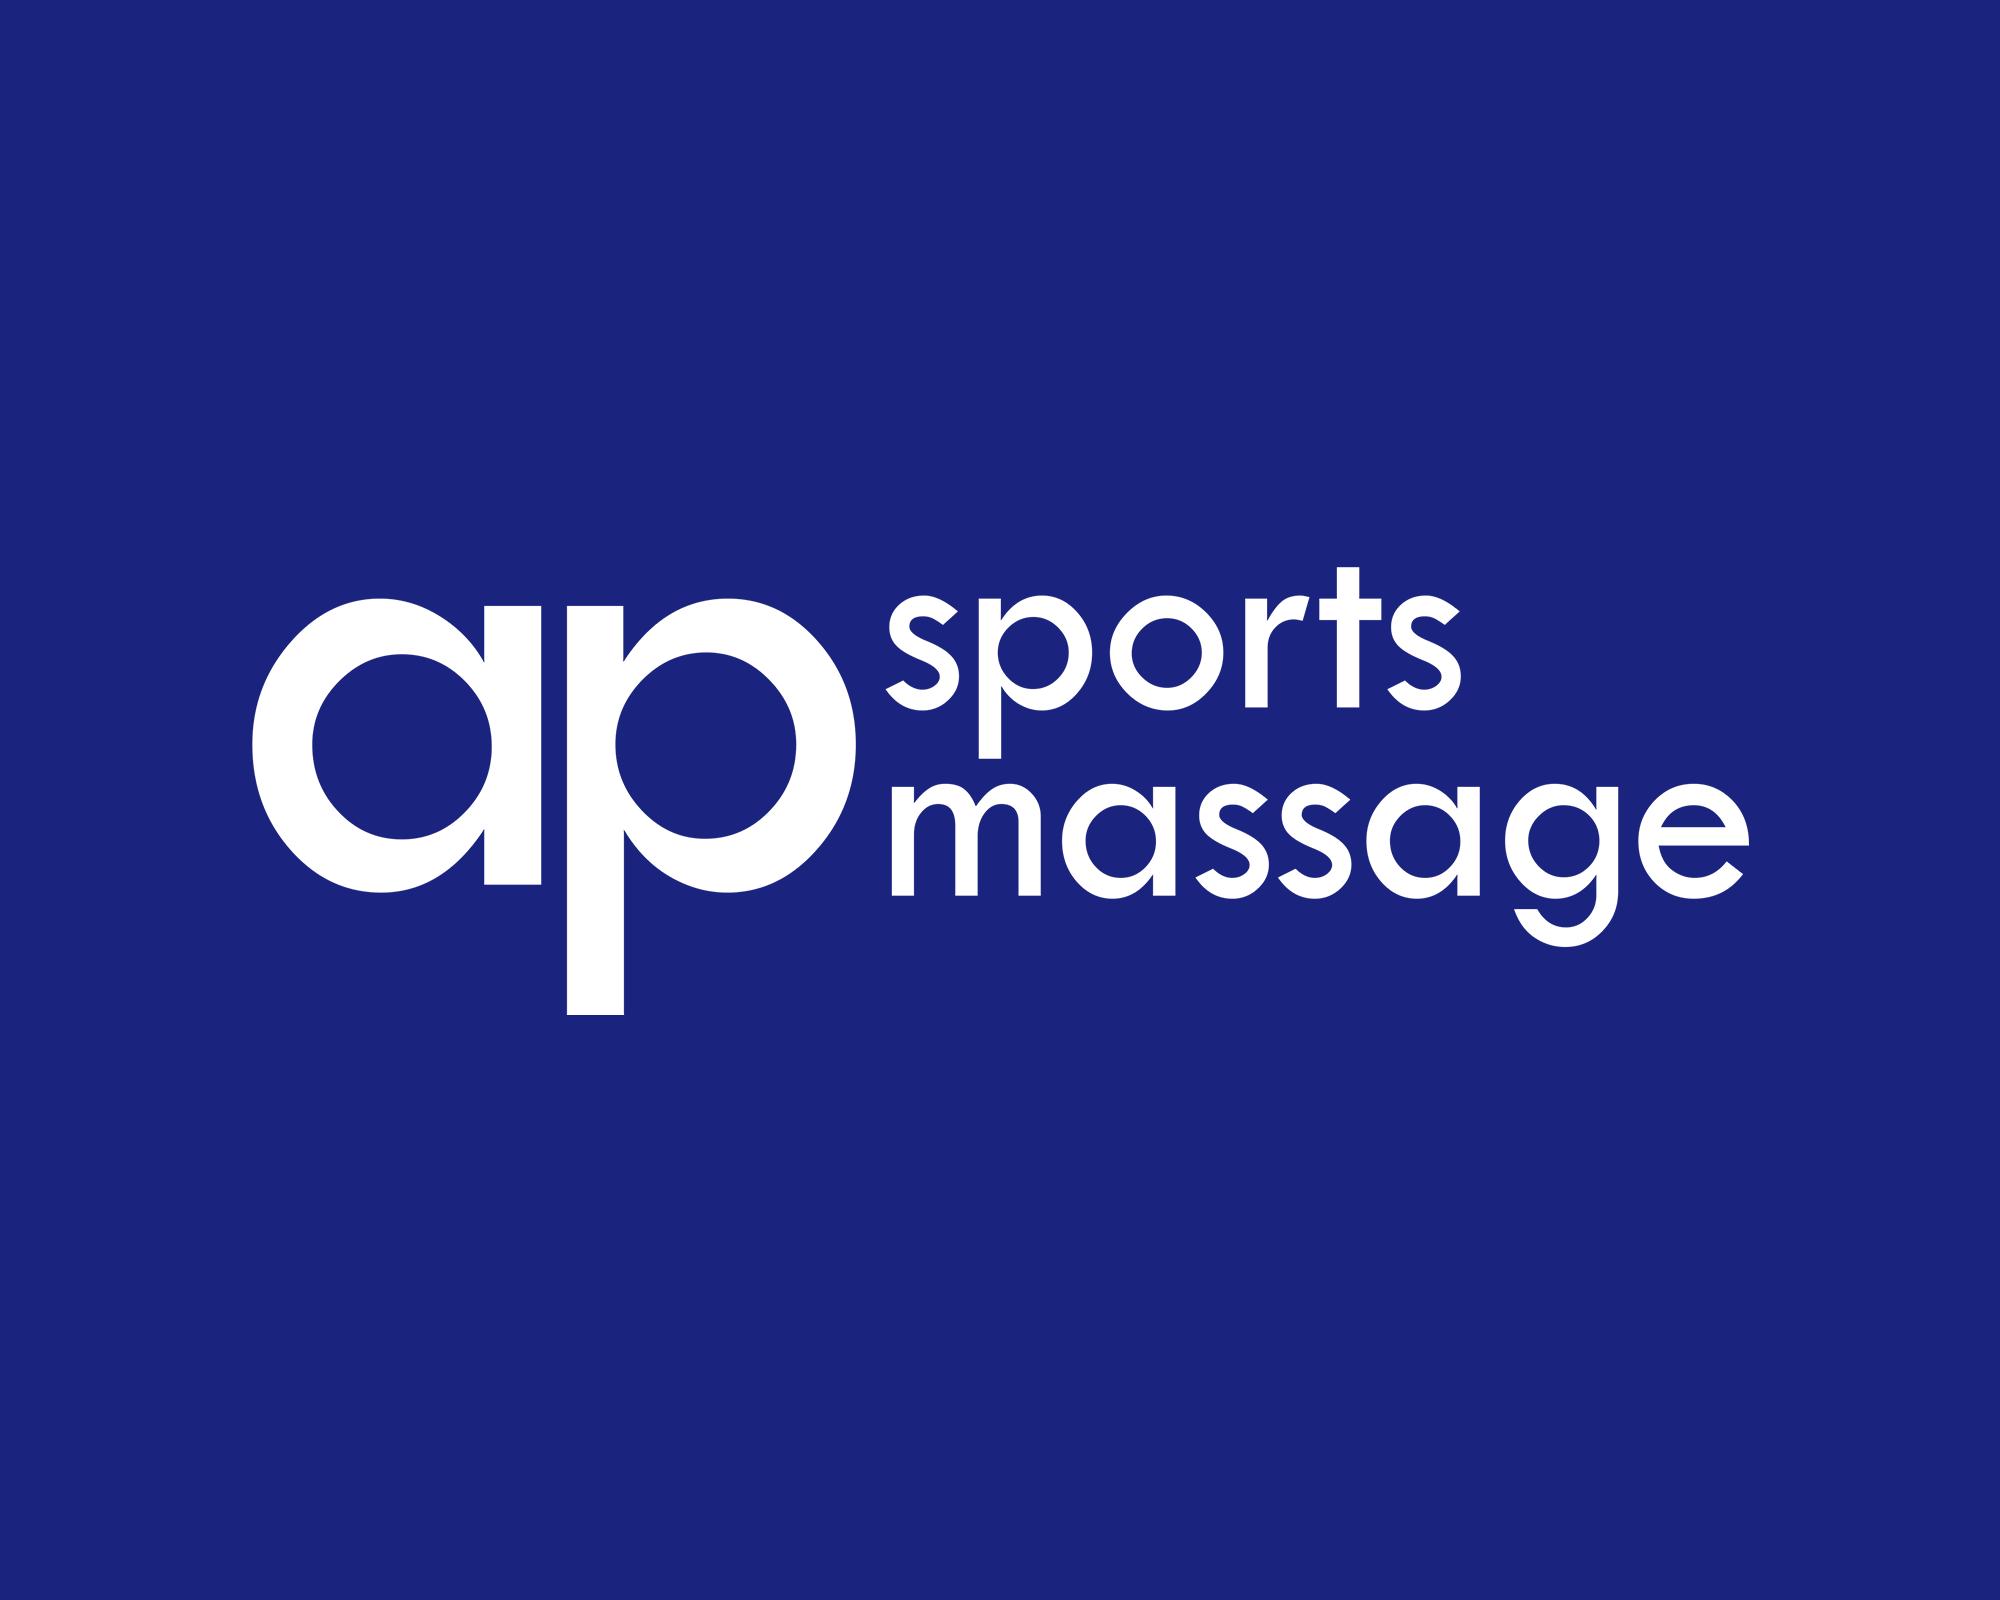 ap sports massage Logo